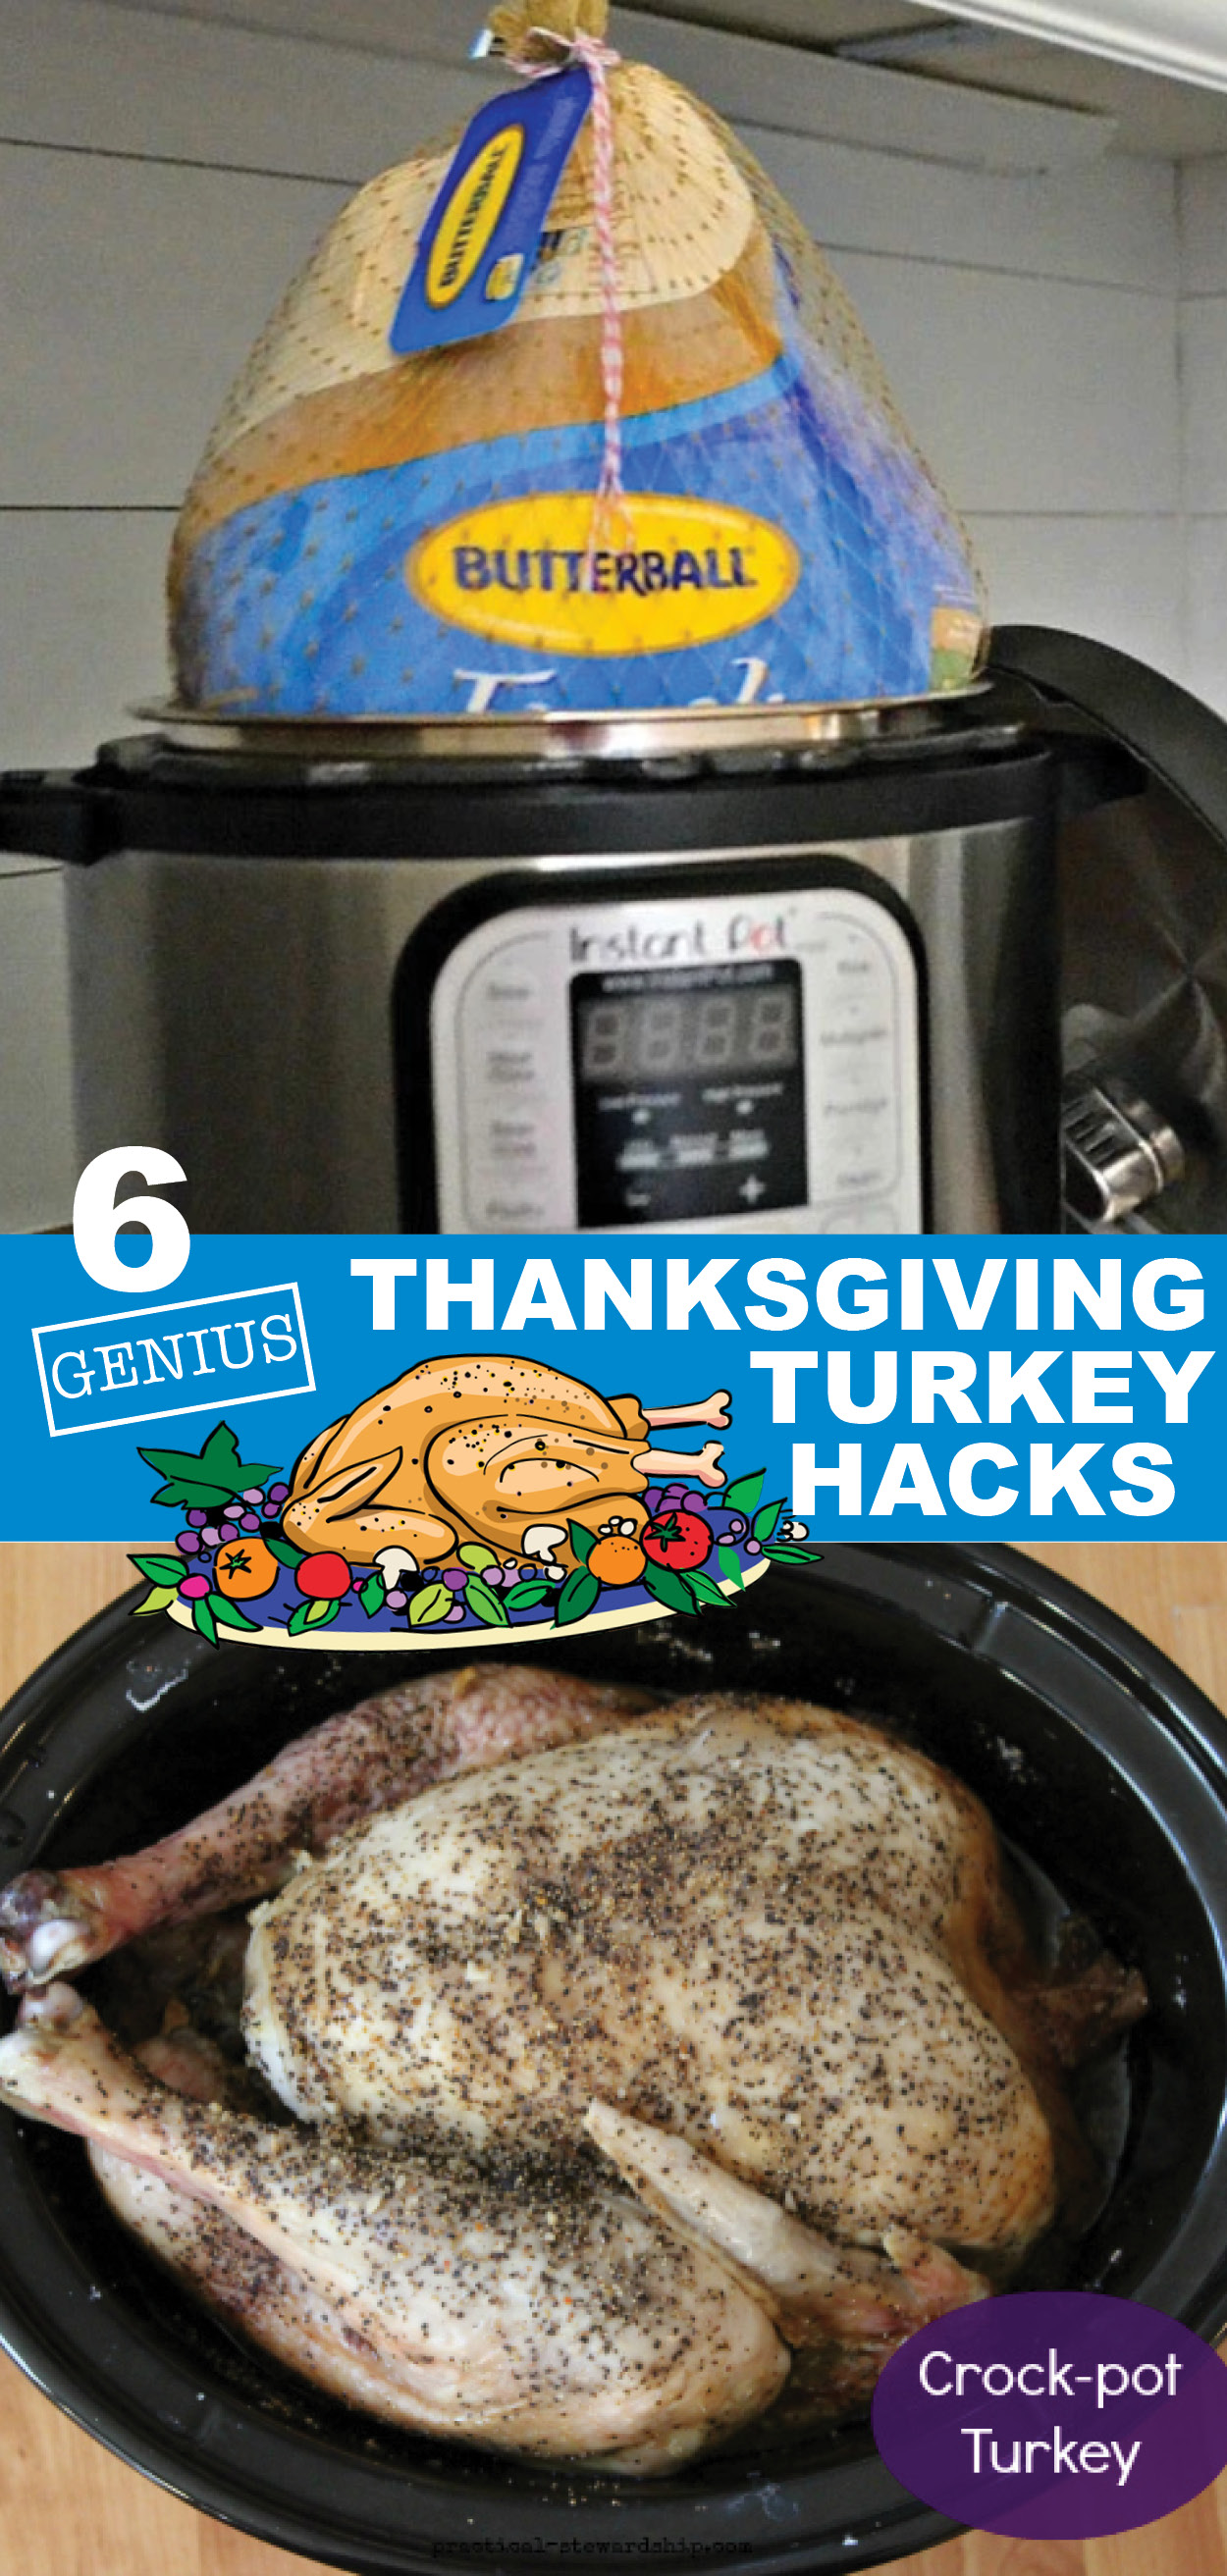 6 Genius Thanksgiving Turkey Hacks